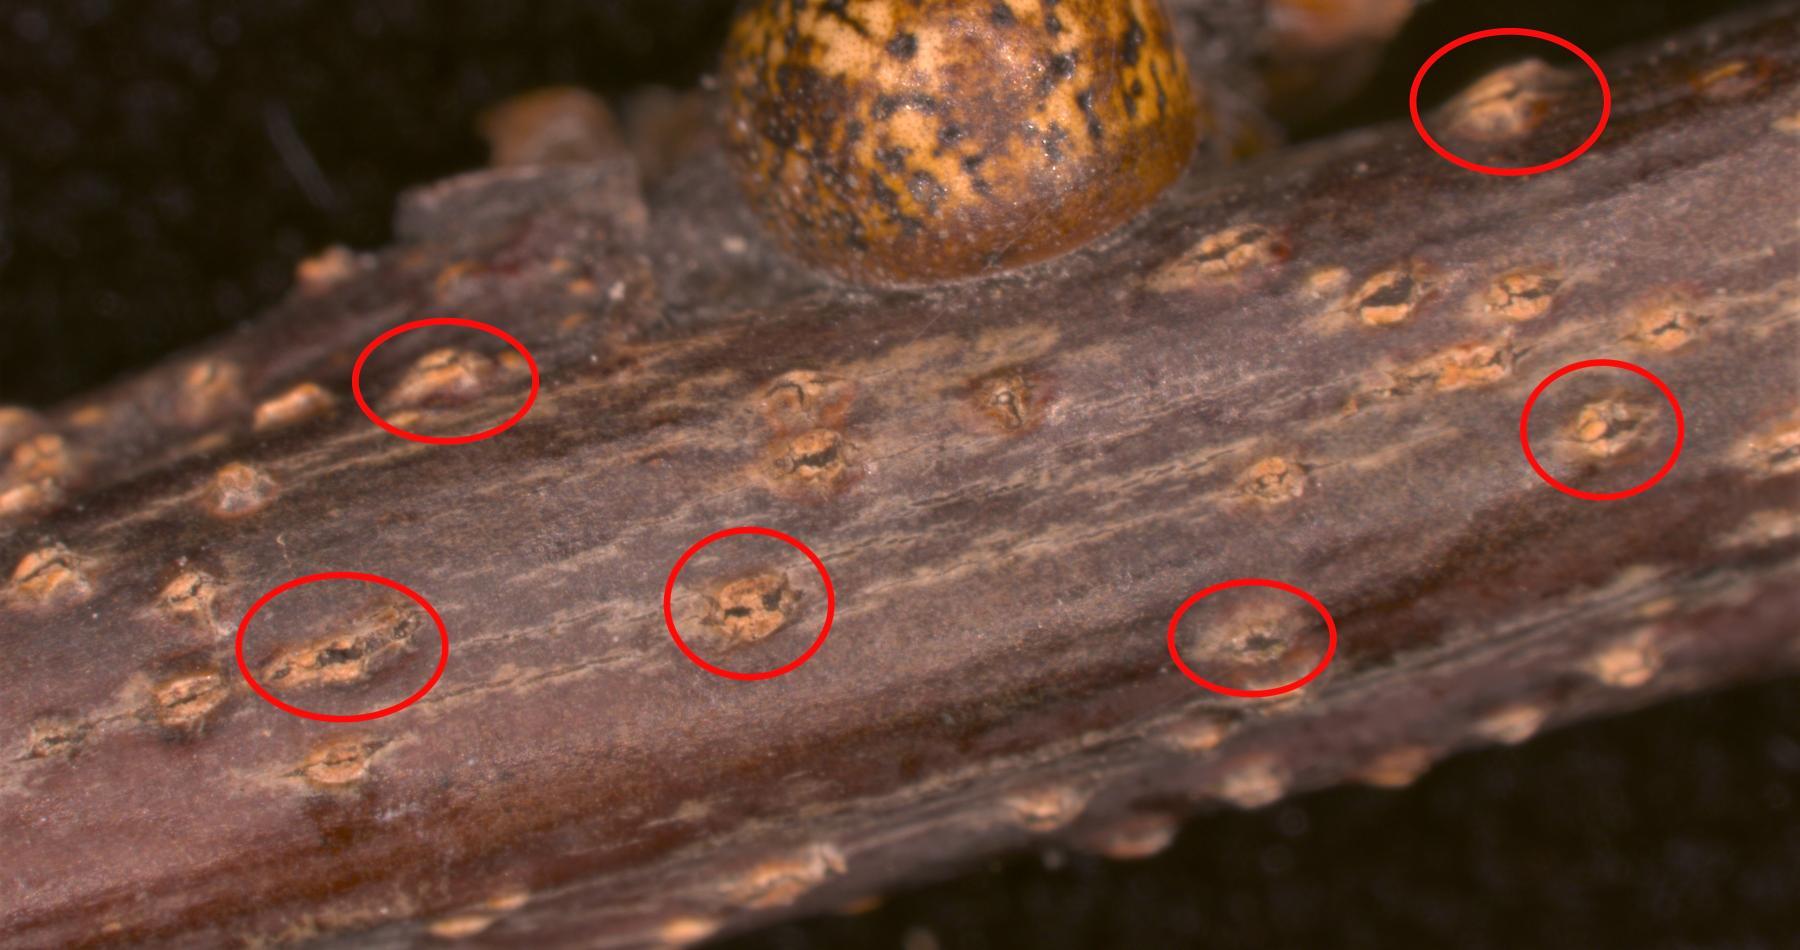 Red Oak Lecanium Scale Diplodia Canker